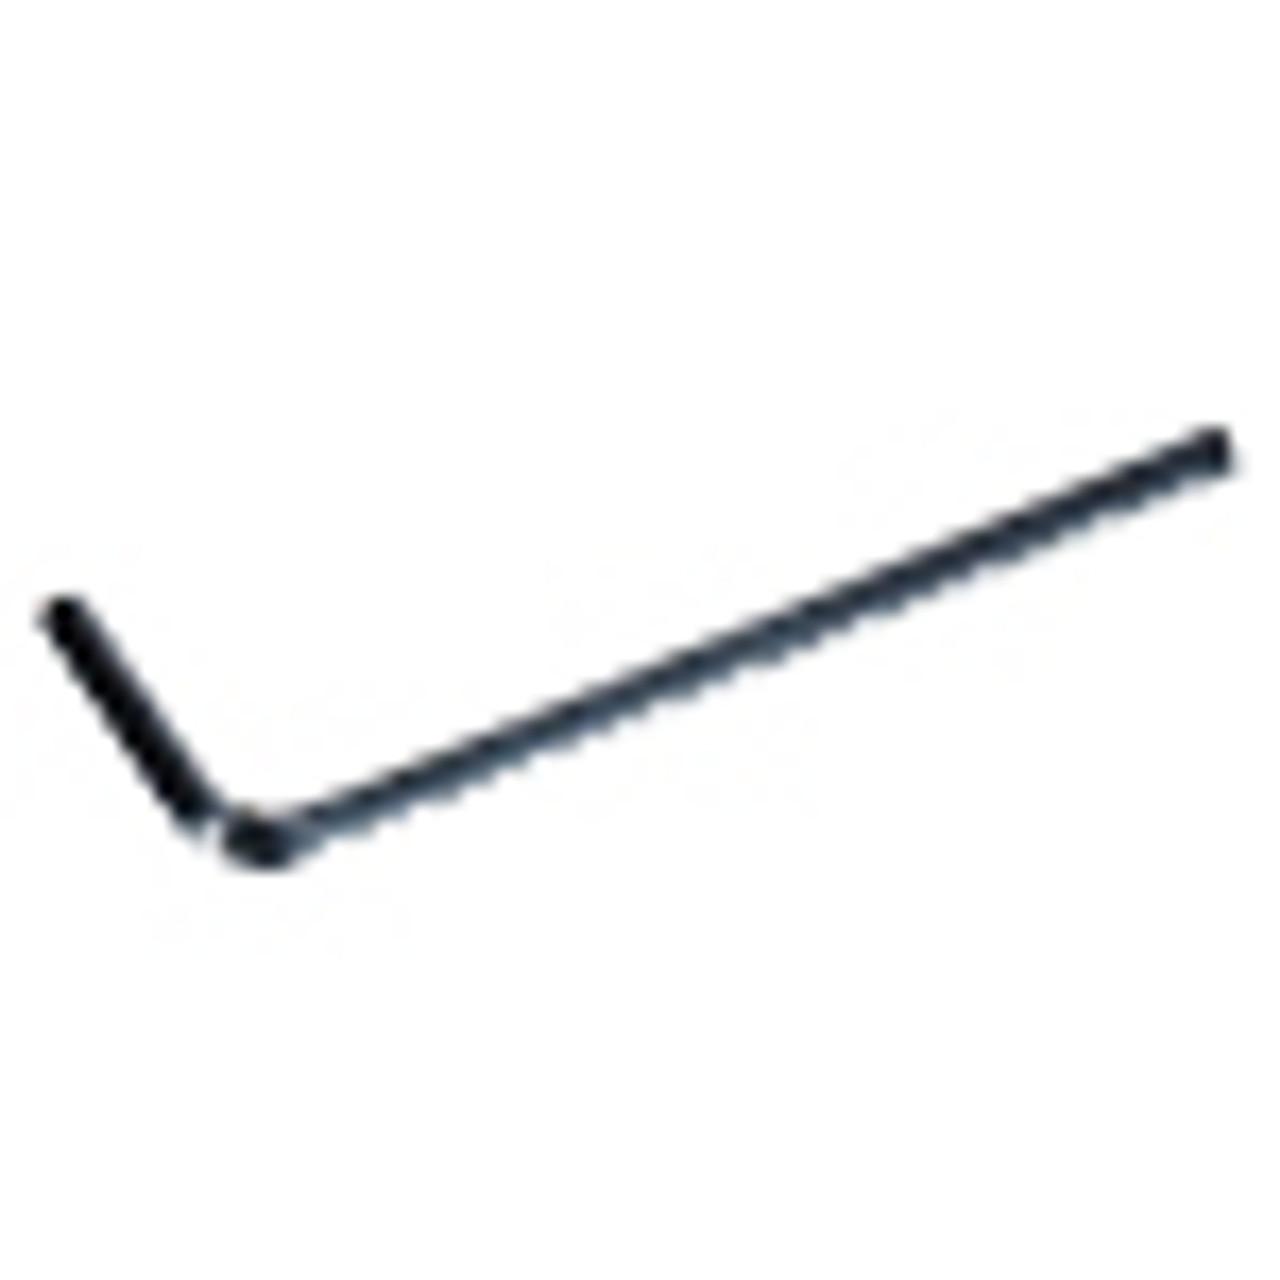 UTG Pro M-LOK Standard QD Sling Swivel Adaptor, Black